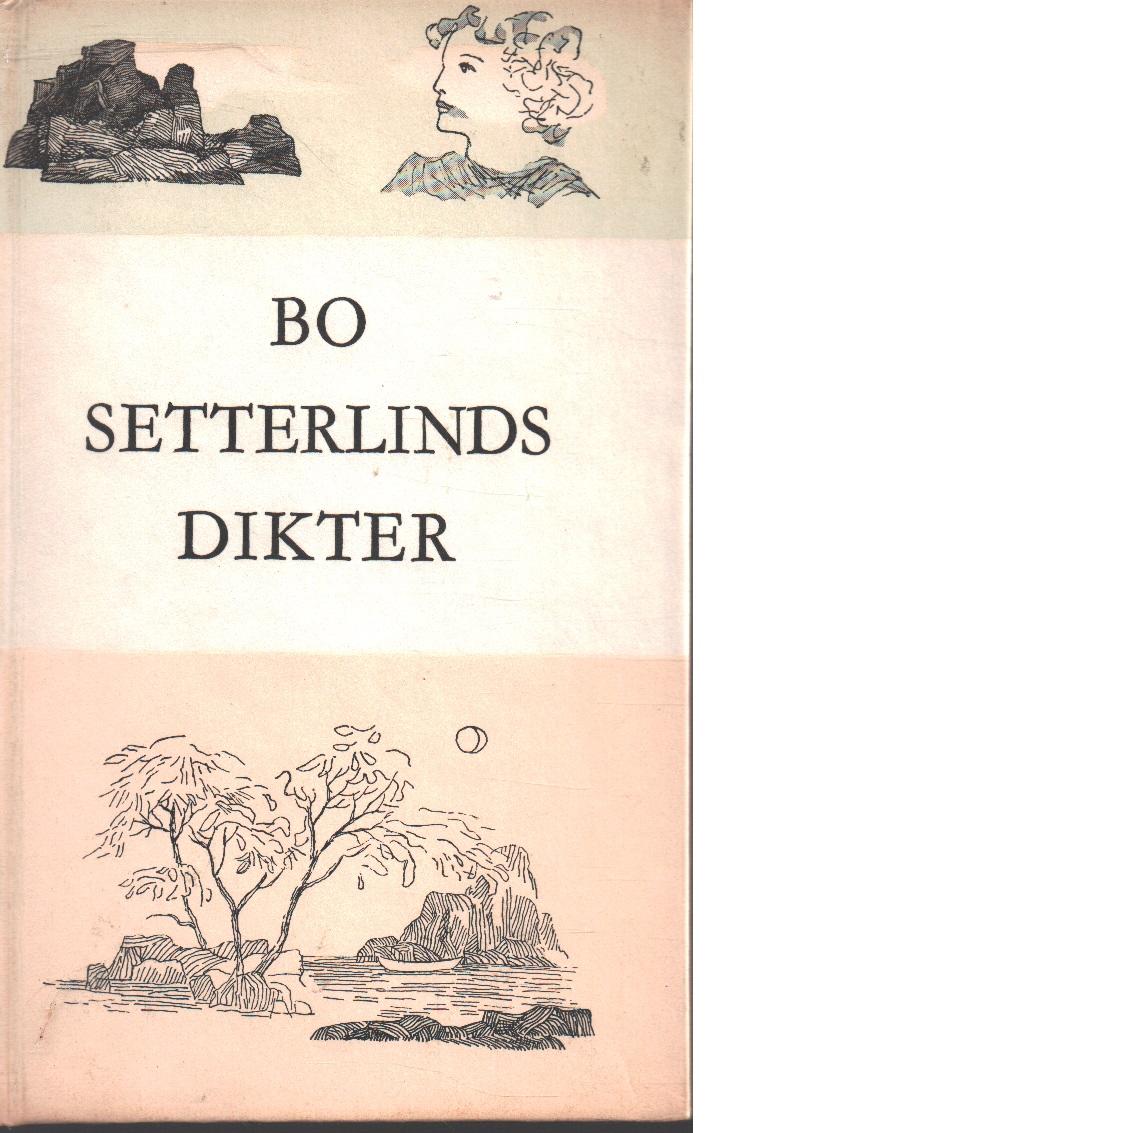 Bo Setterlinds dikter - i urval och med kommentarer av författaren - Setterlind, Bo